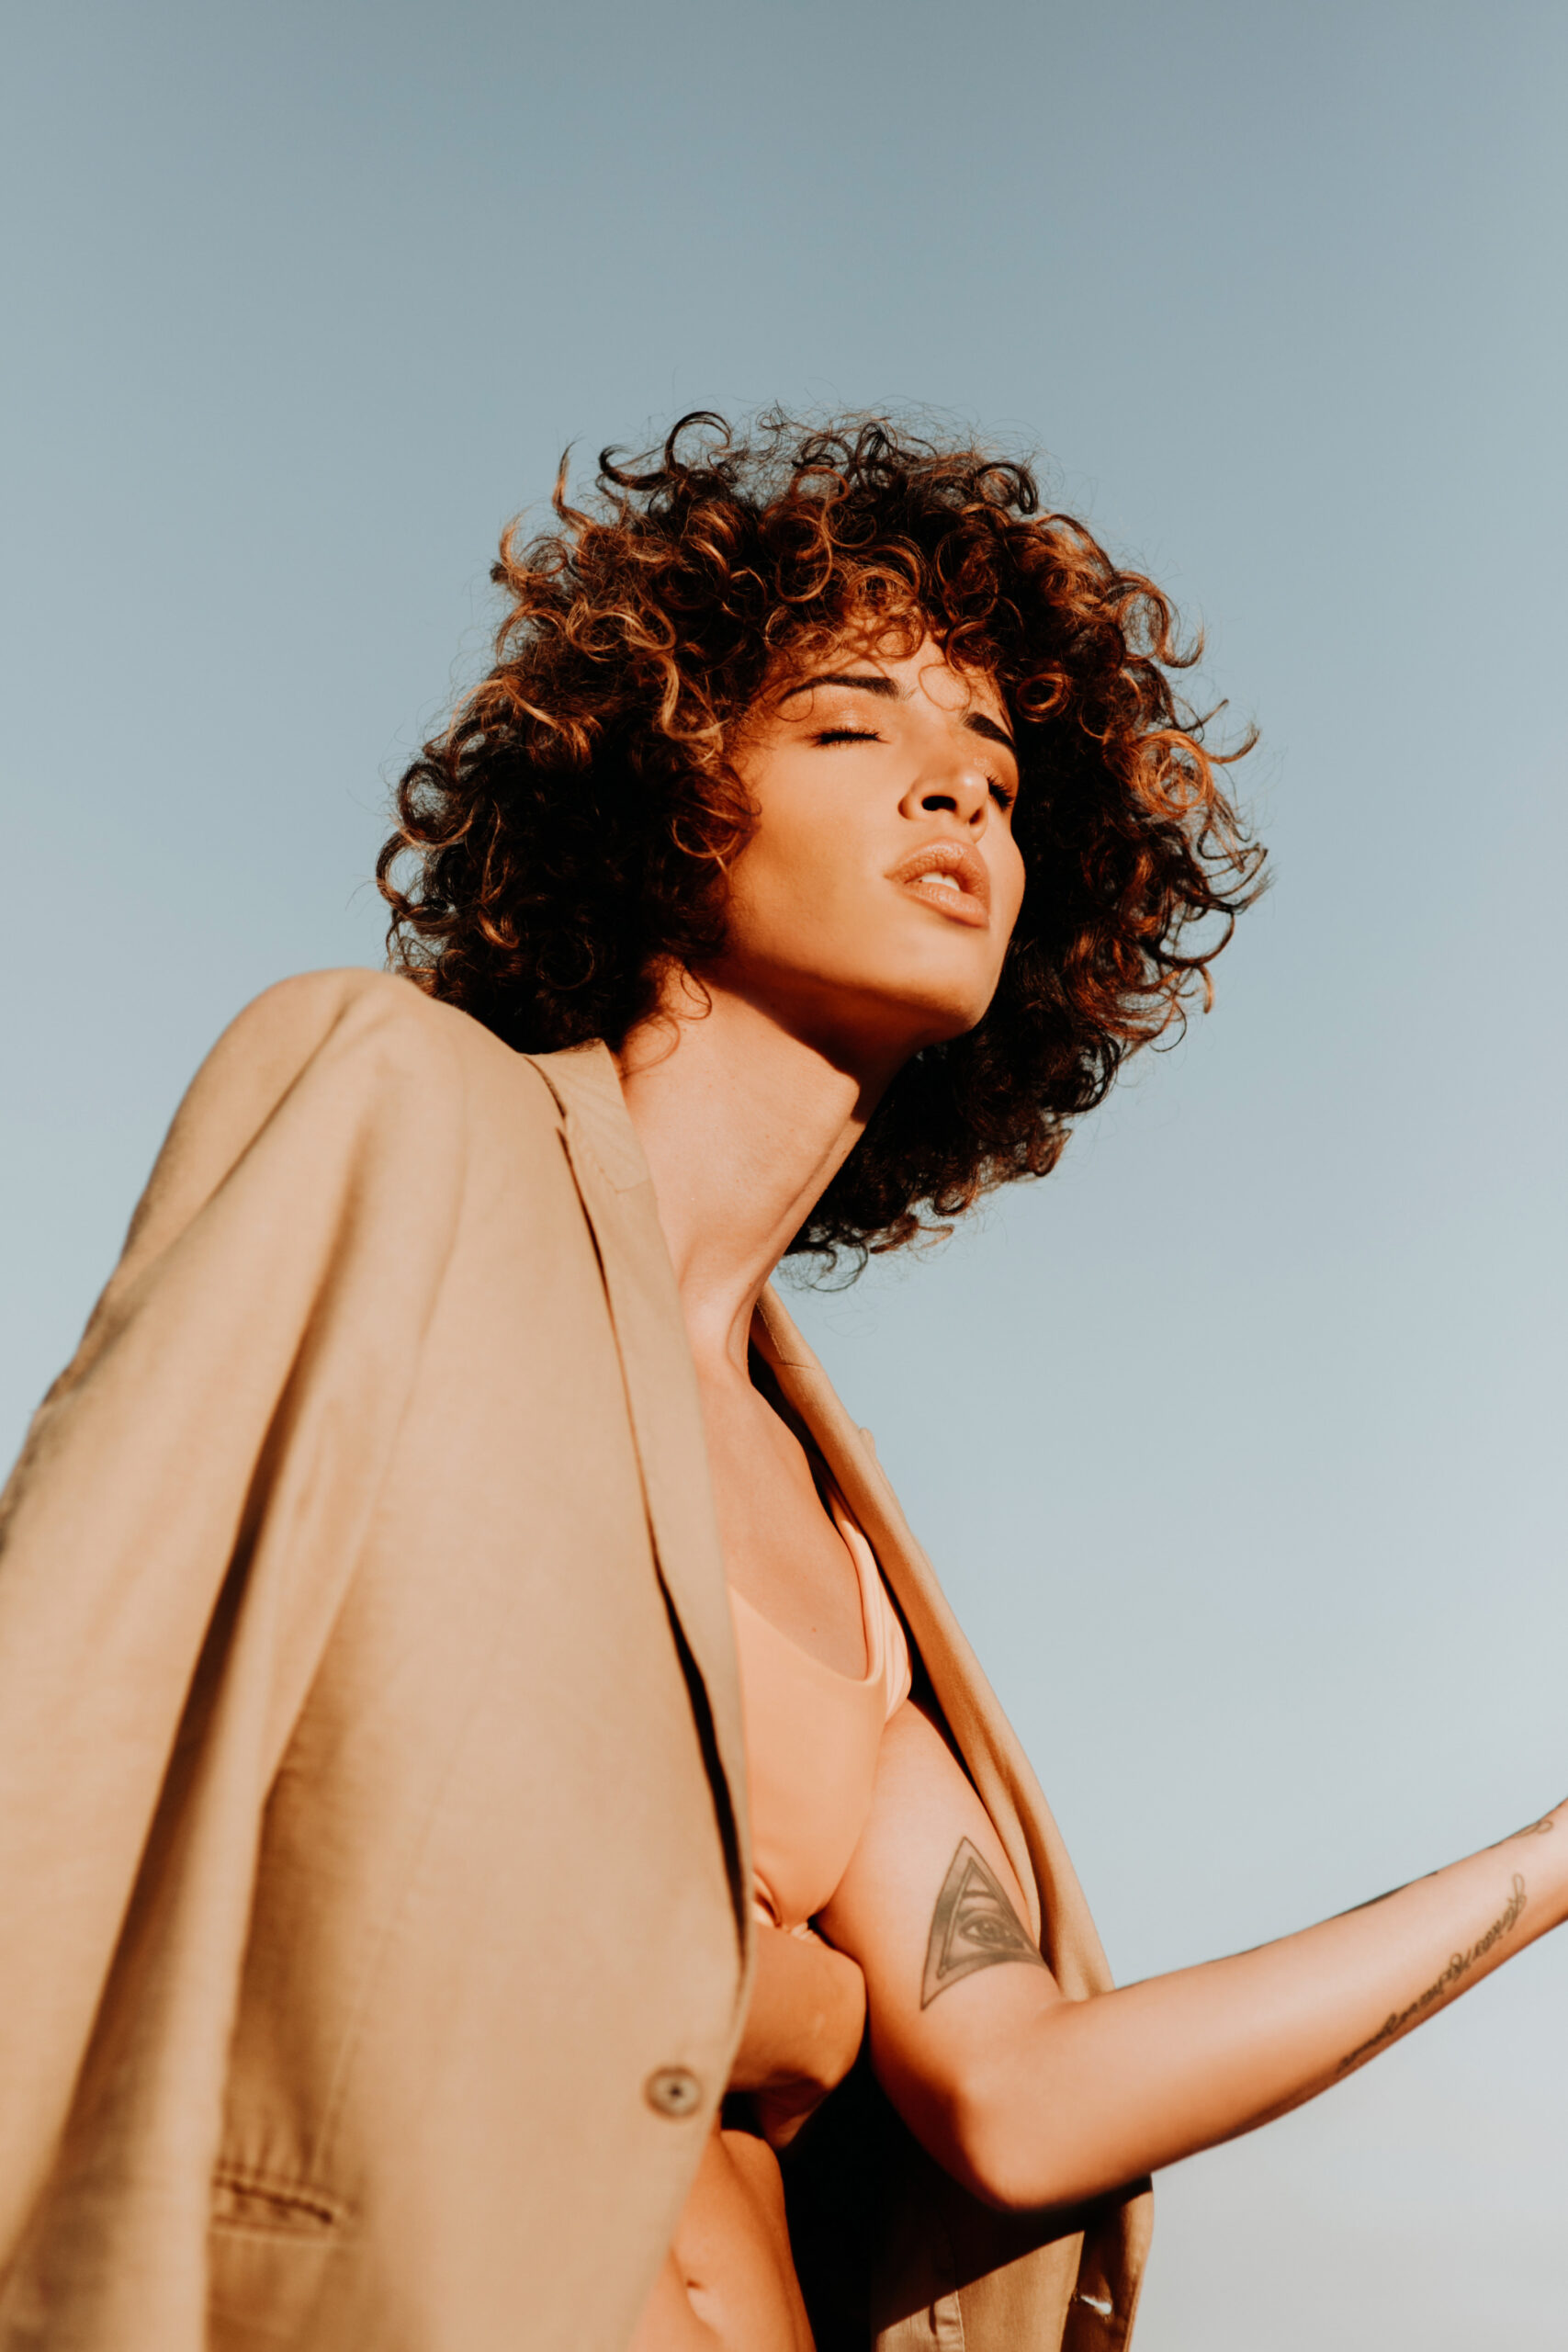 Fashion-Fotograf-Duesseldorf-Mode-Fotograf-Fashionfotografie-Modefotografie-Anna-Fichtnera-f2